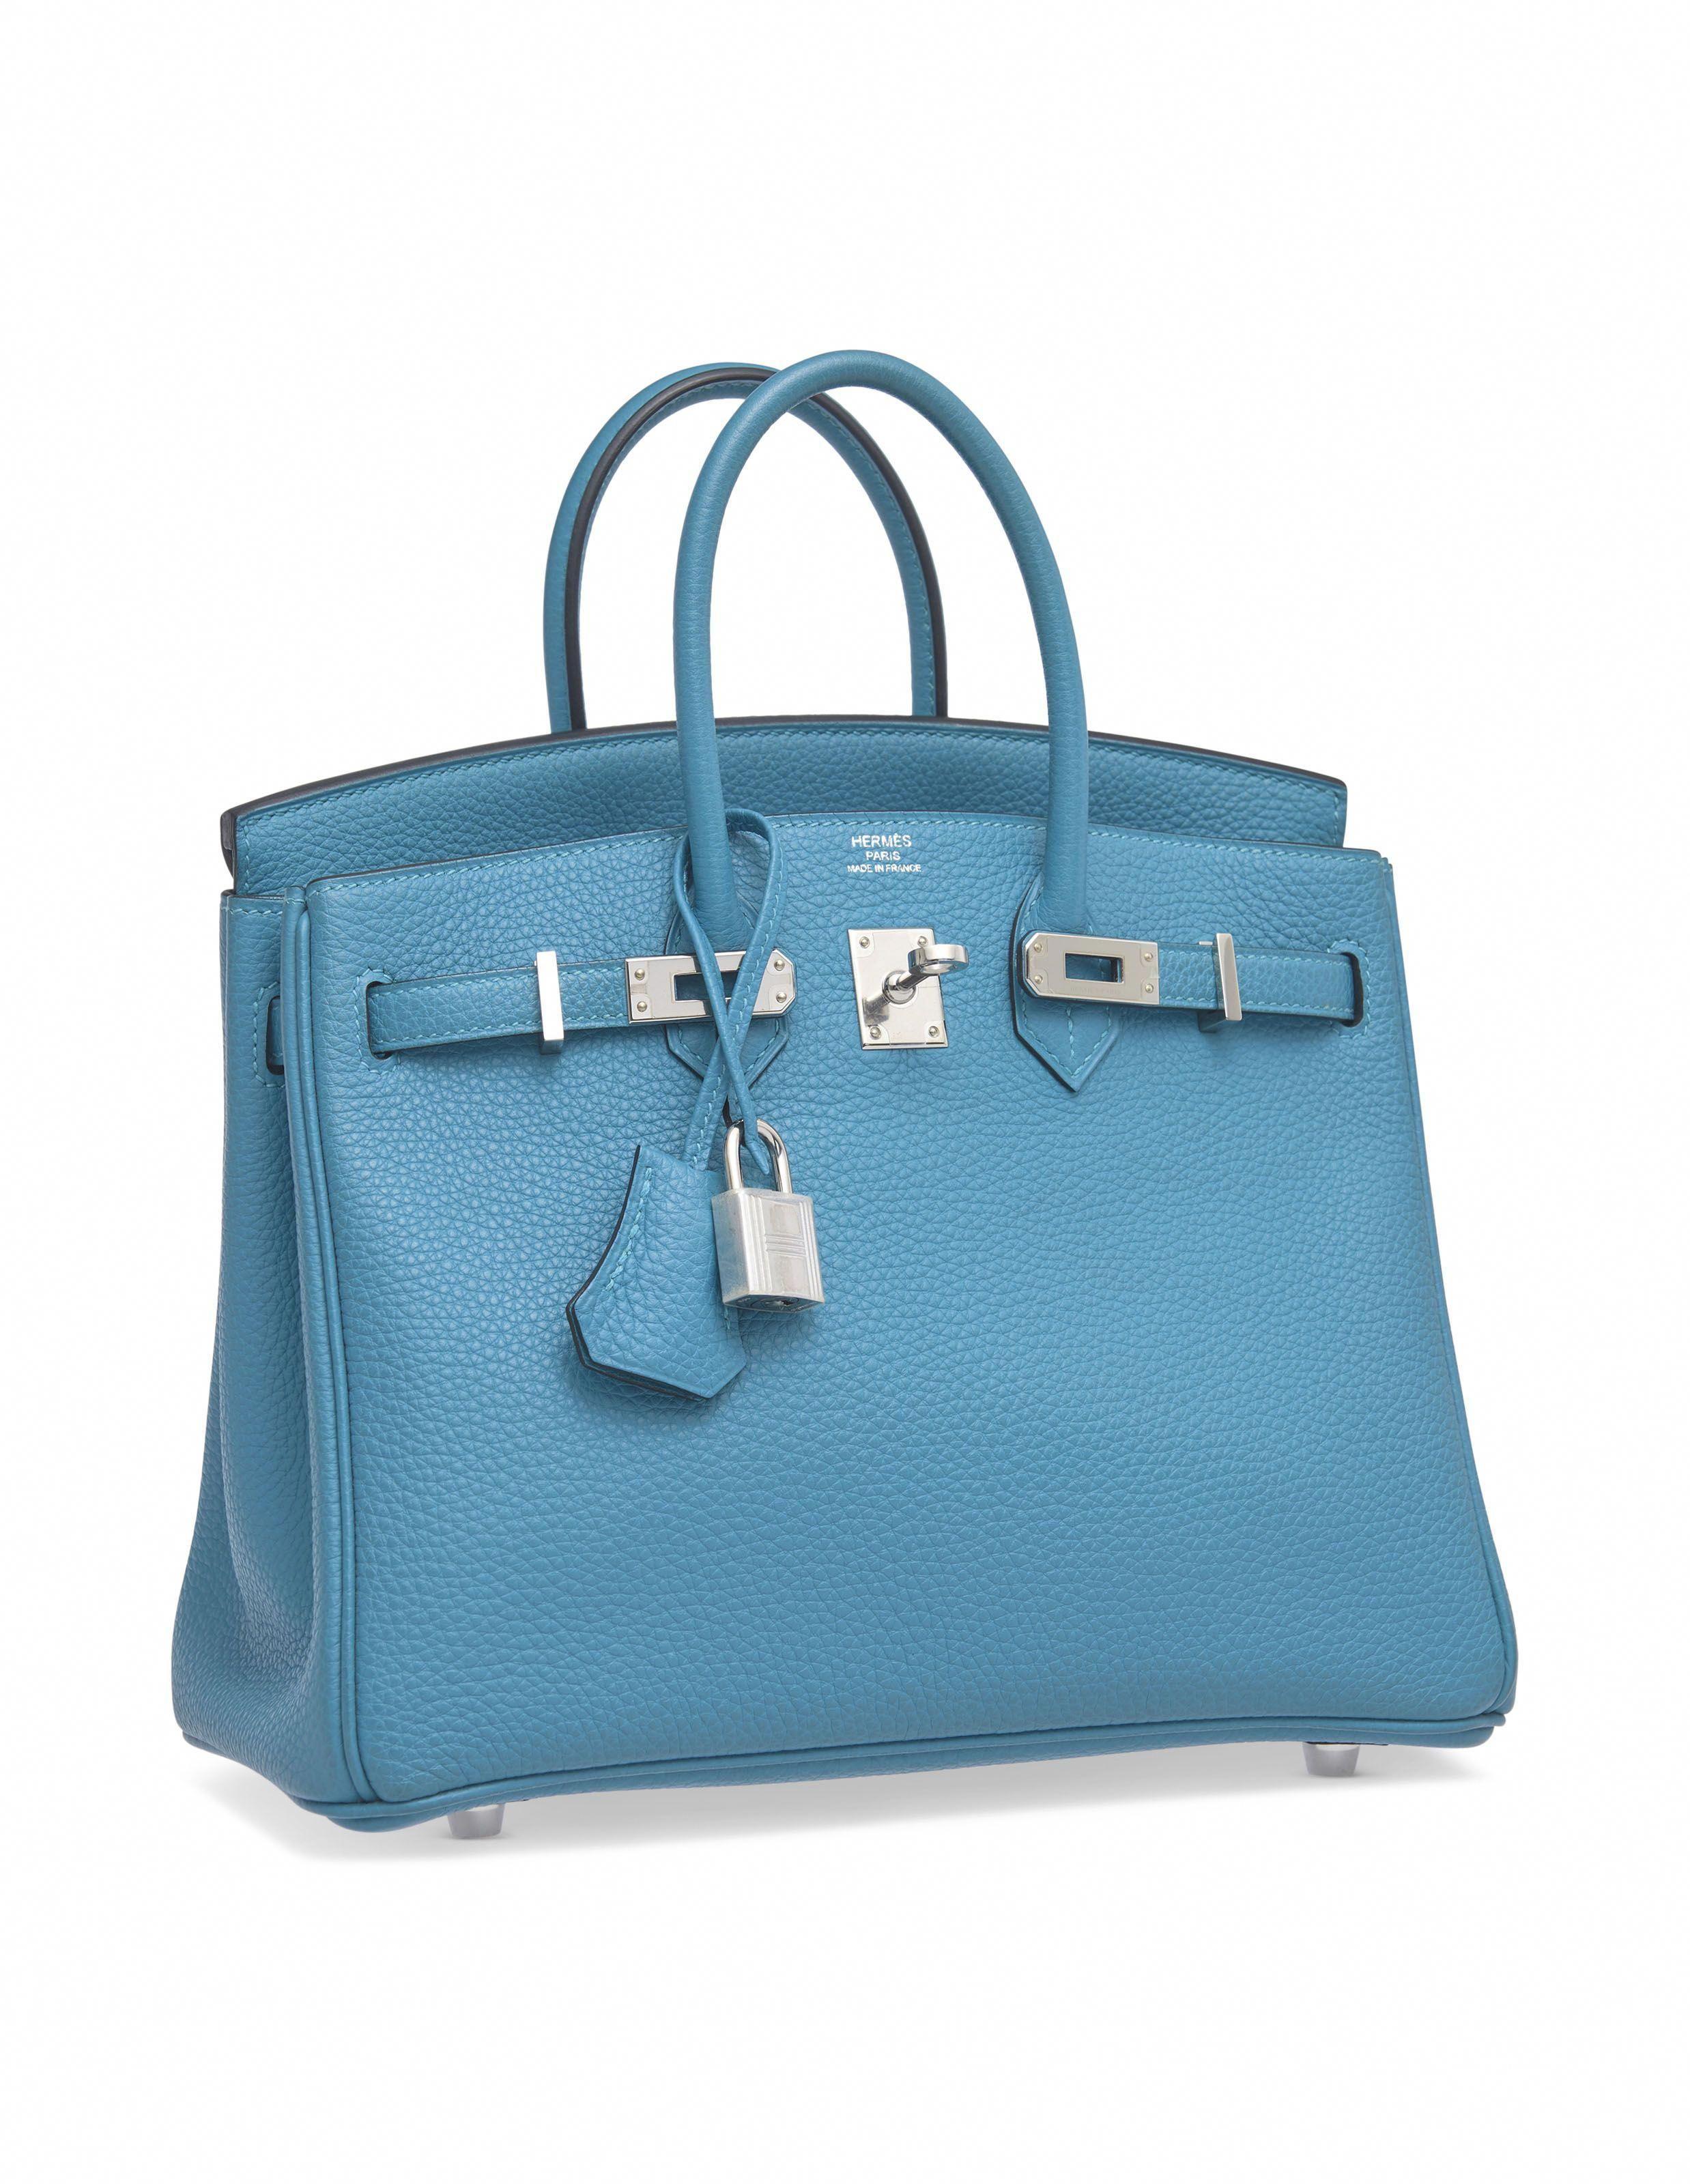 58fe32d3598299 hermes handbags uk harrods #Hermeshandbags   laukkuja/ bags – 2019 ...